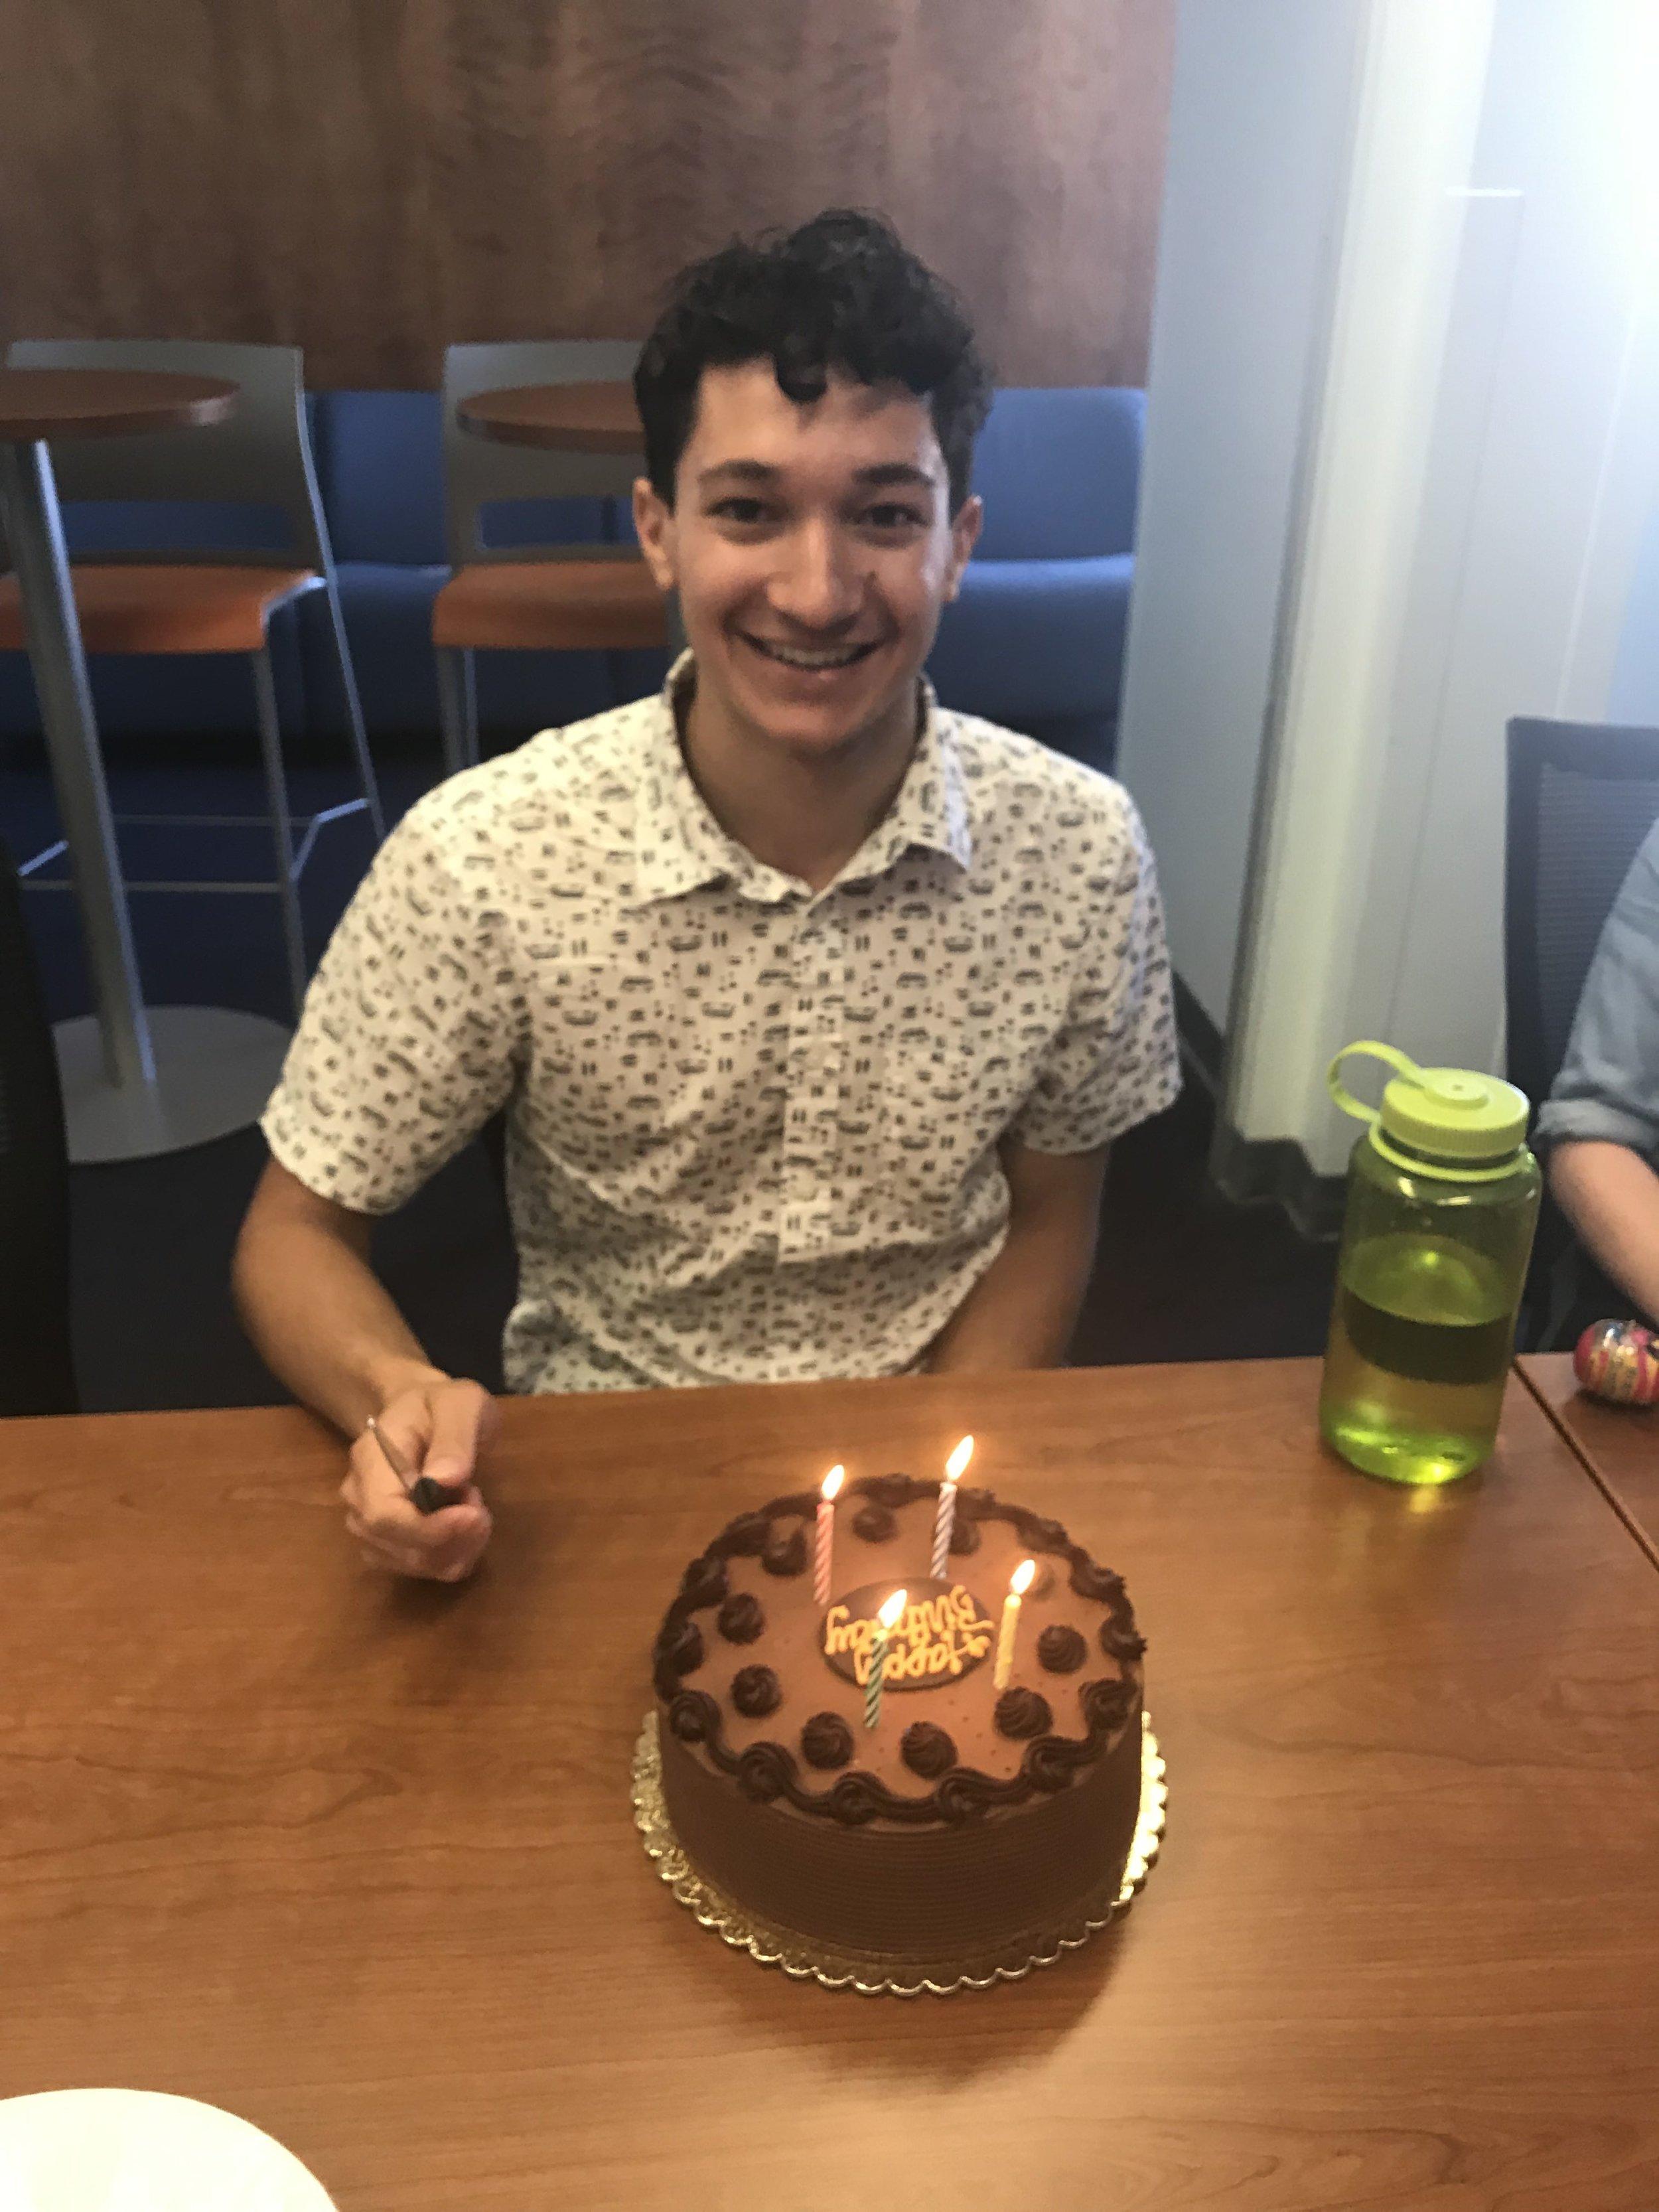 Happy Birthday, Varun!